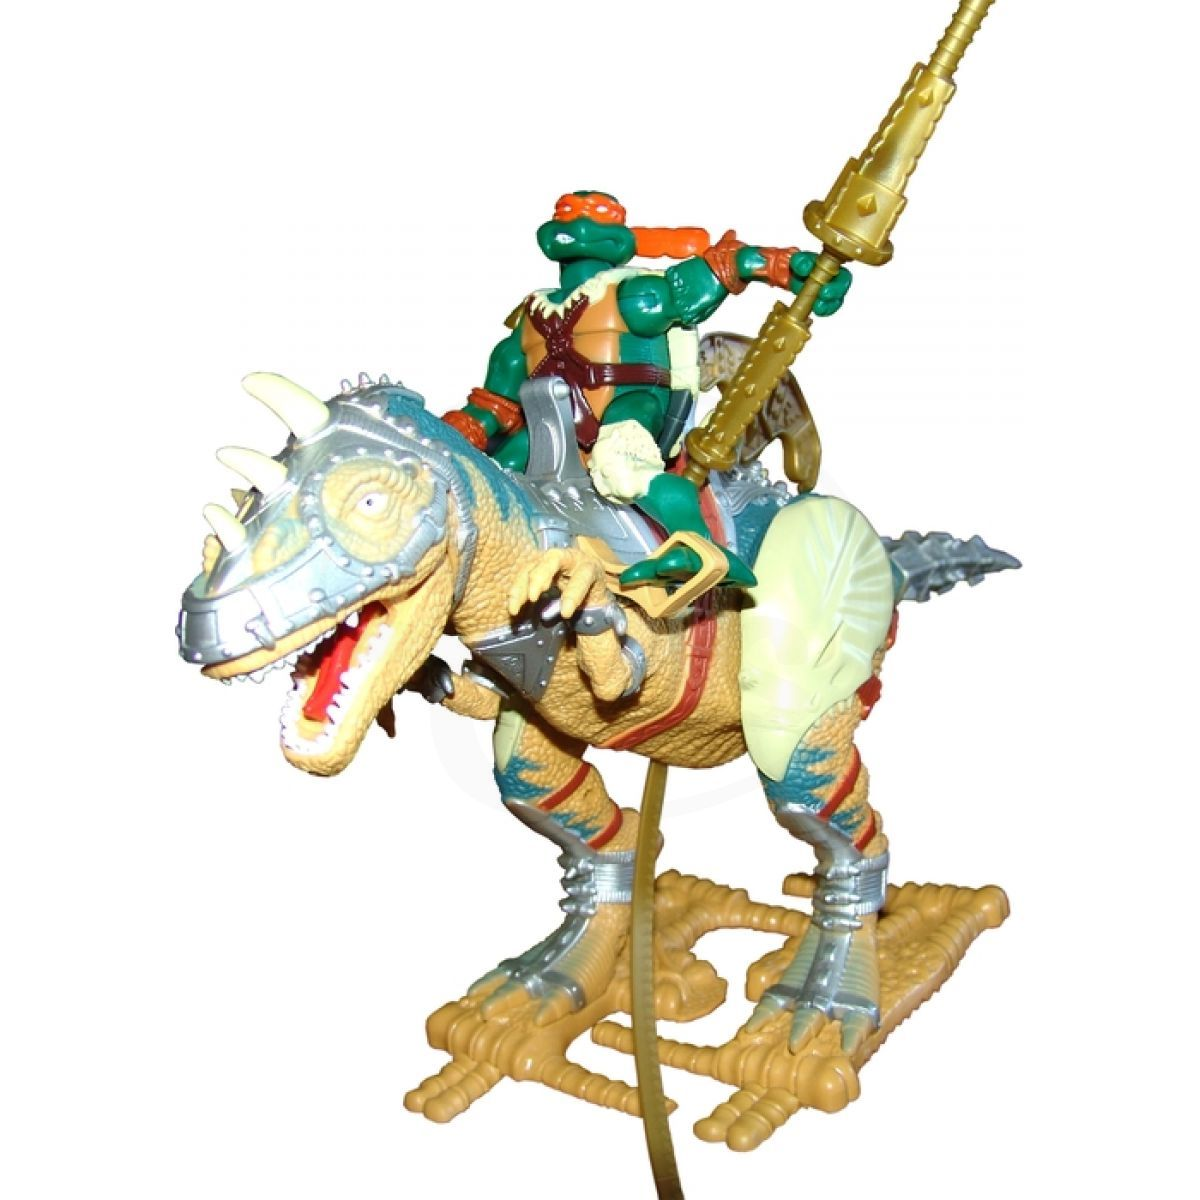 EP Line Želvy Ninja TMNT Super Dino 30 cm a figurka Allosaurus